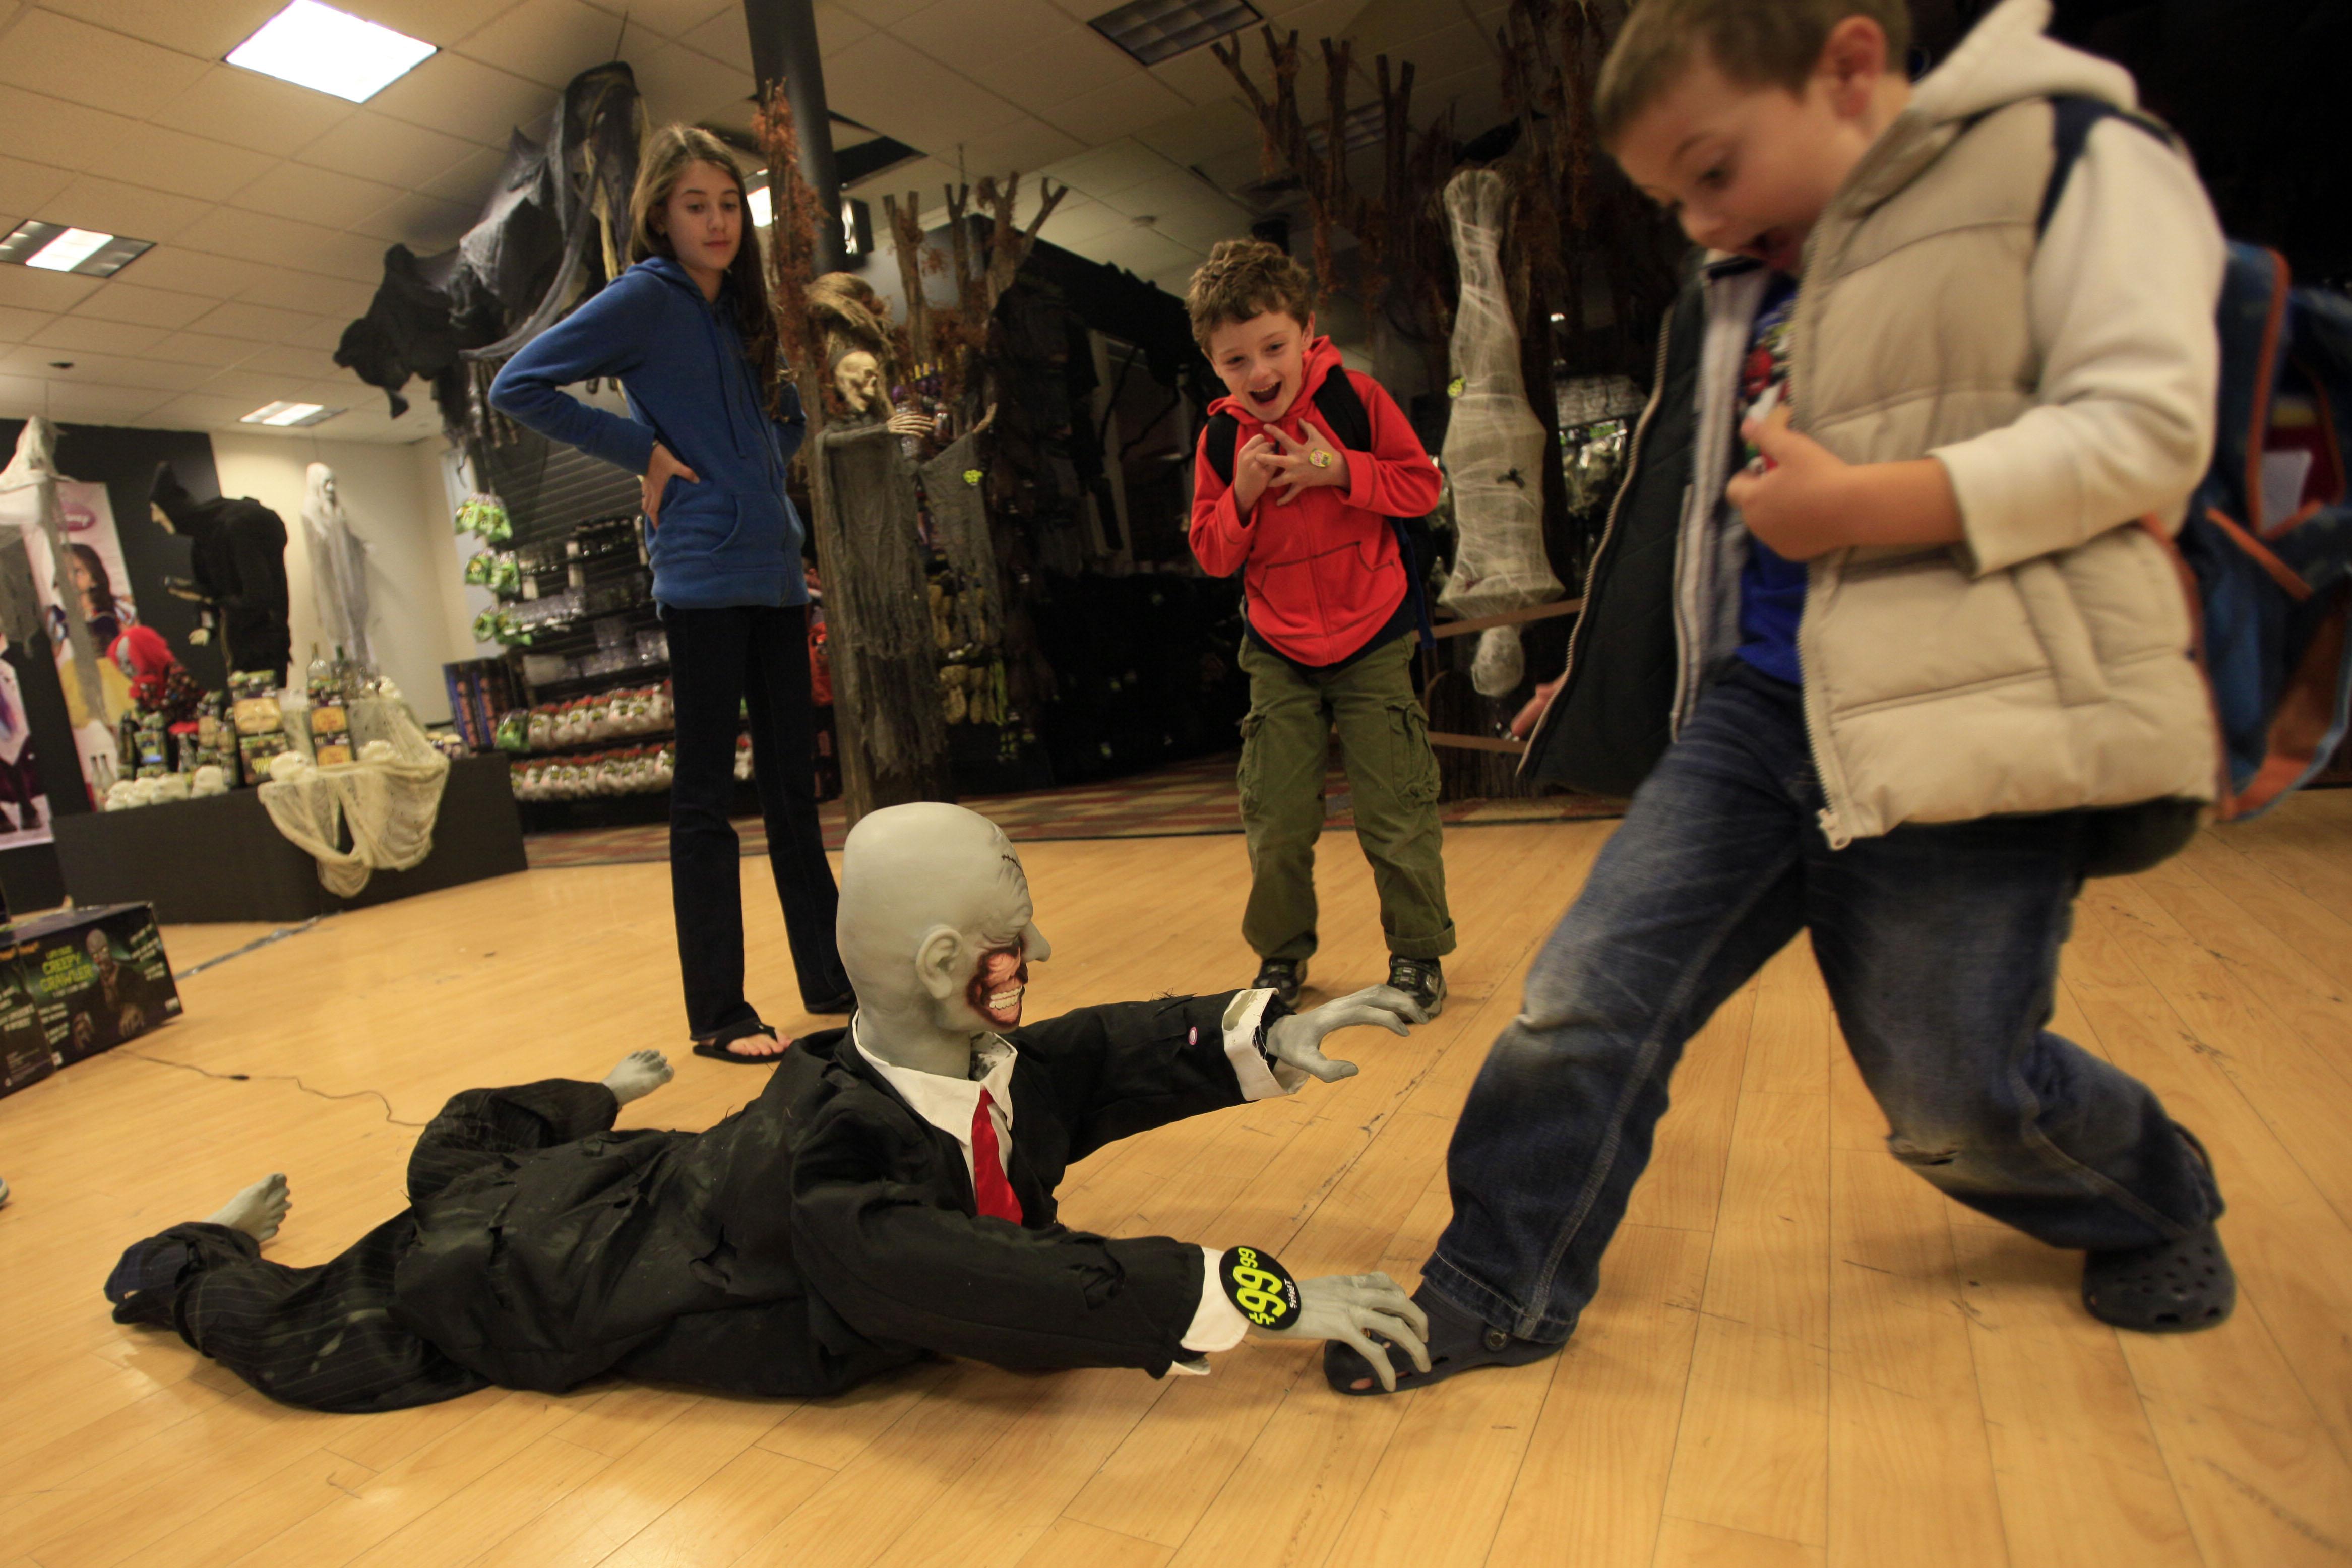 halloween stores pop up in old retail haunts | the spokesman-review